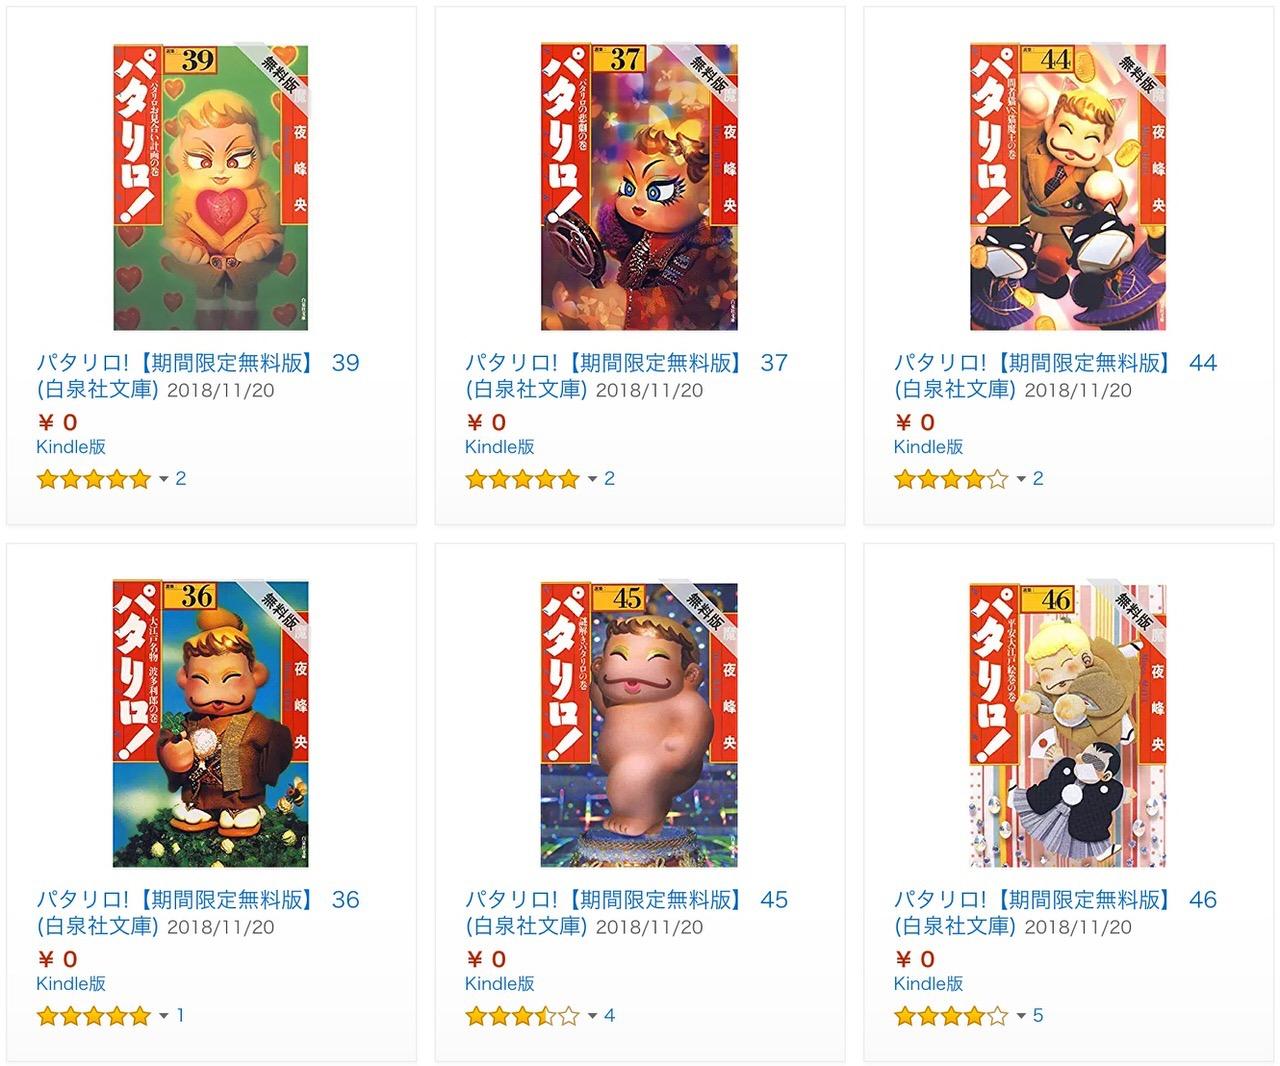 【Kindleセール】パタリロ1〜50巻が期間限定無料!100巻発売記念「パタリロ!」100×100フェア!(11/21まで)